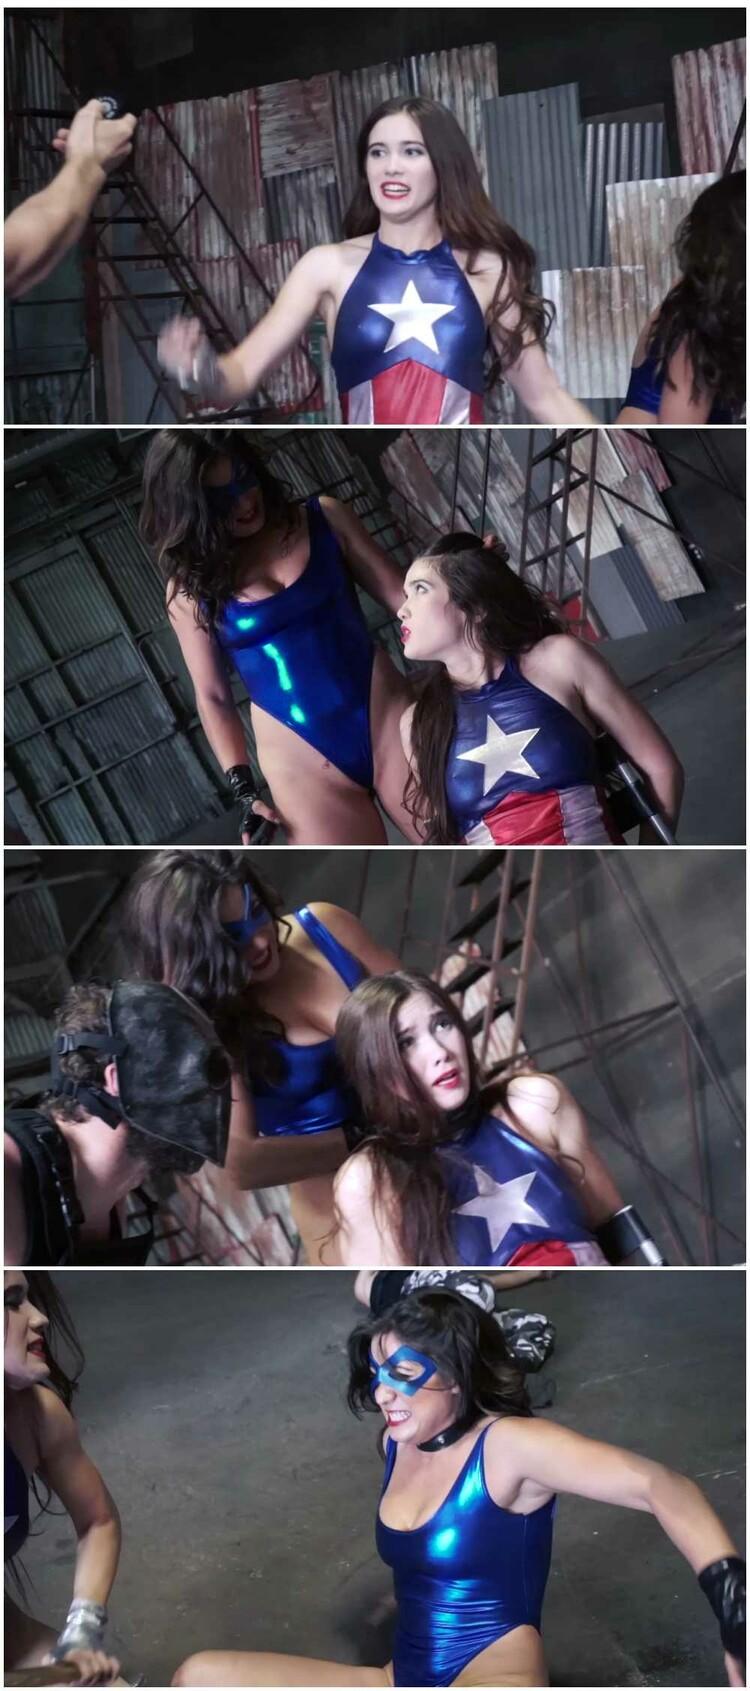 naughty-super-heroines-gifs-lesbian-xxxl-porn